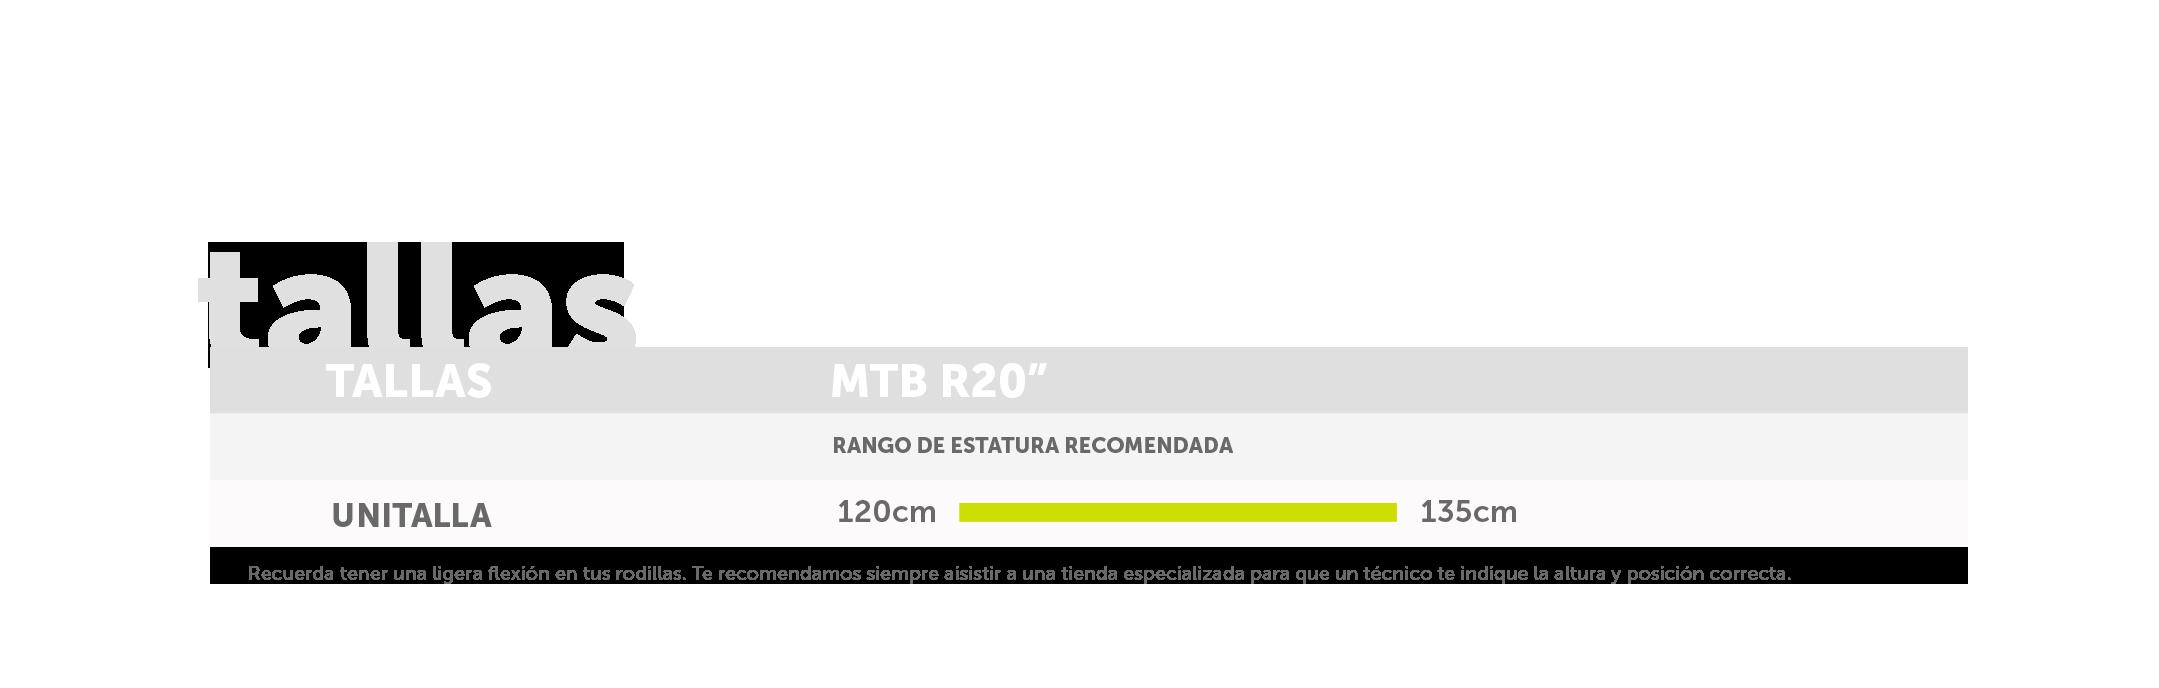 K20_GEOMETRÍAS.png